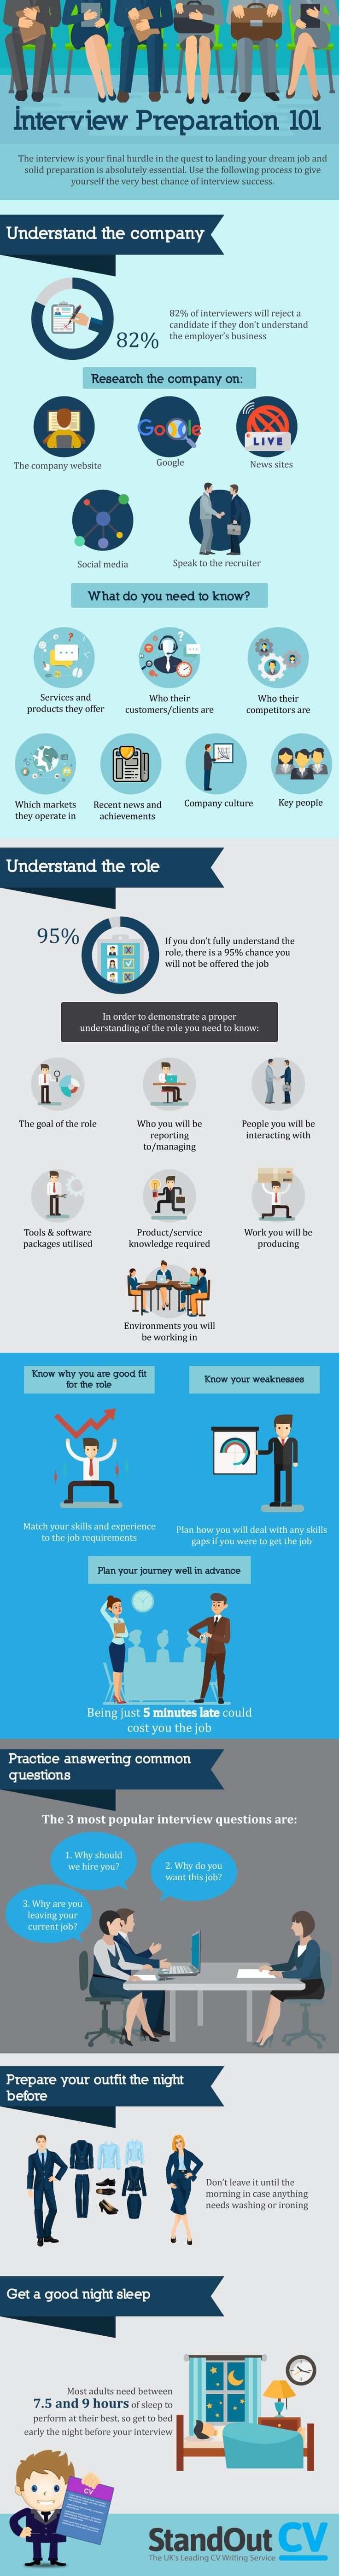 Interview Preparation 101 #Infographic